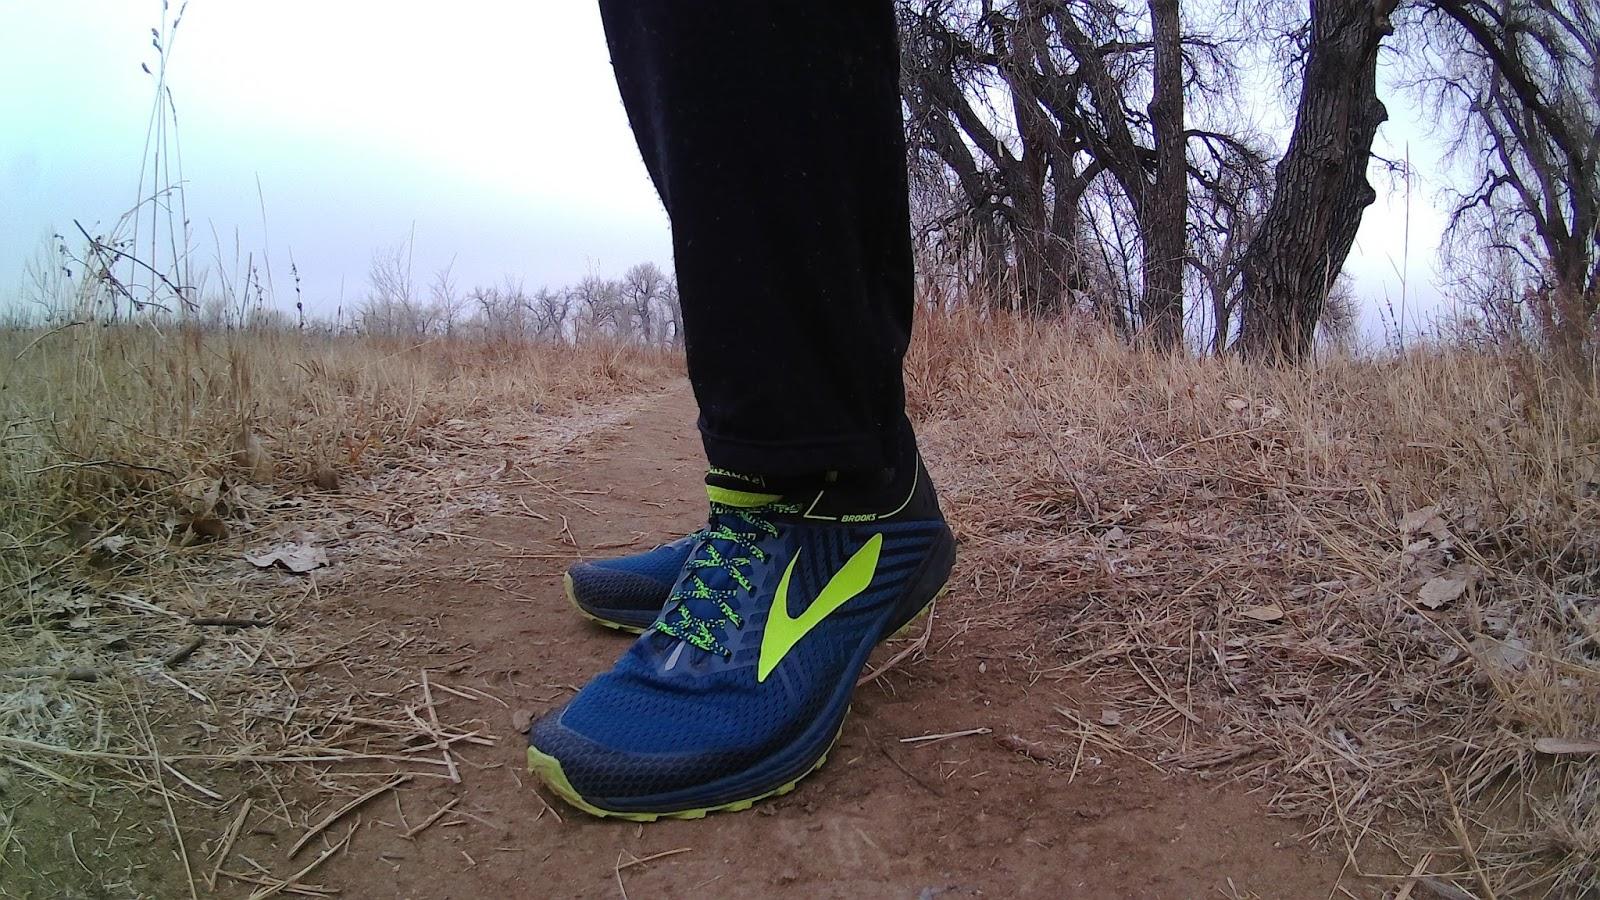 a16456bac8b Road Trail Run  Brooks Running Mazama 2 Review - Fastest Uphill ...